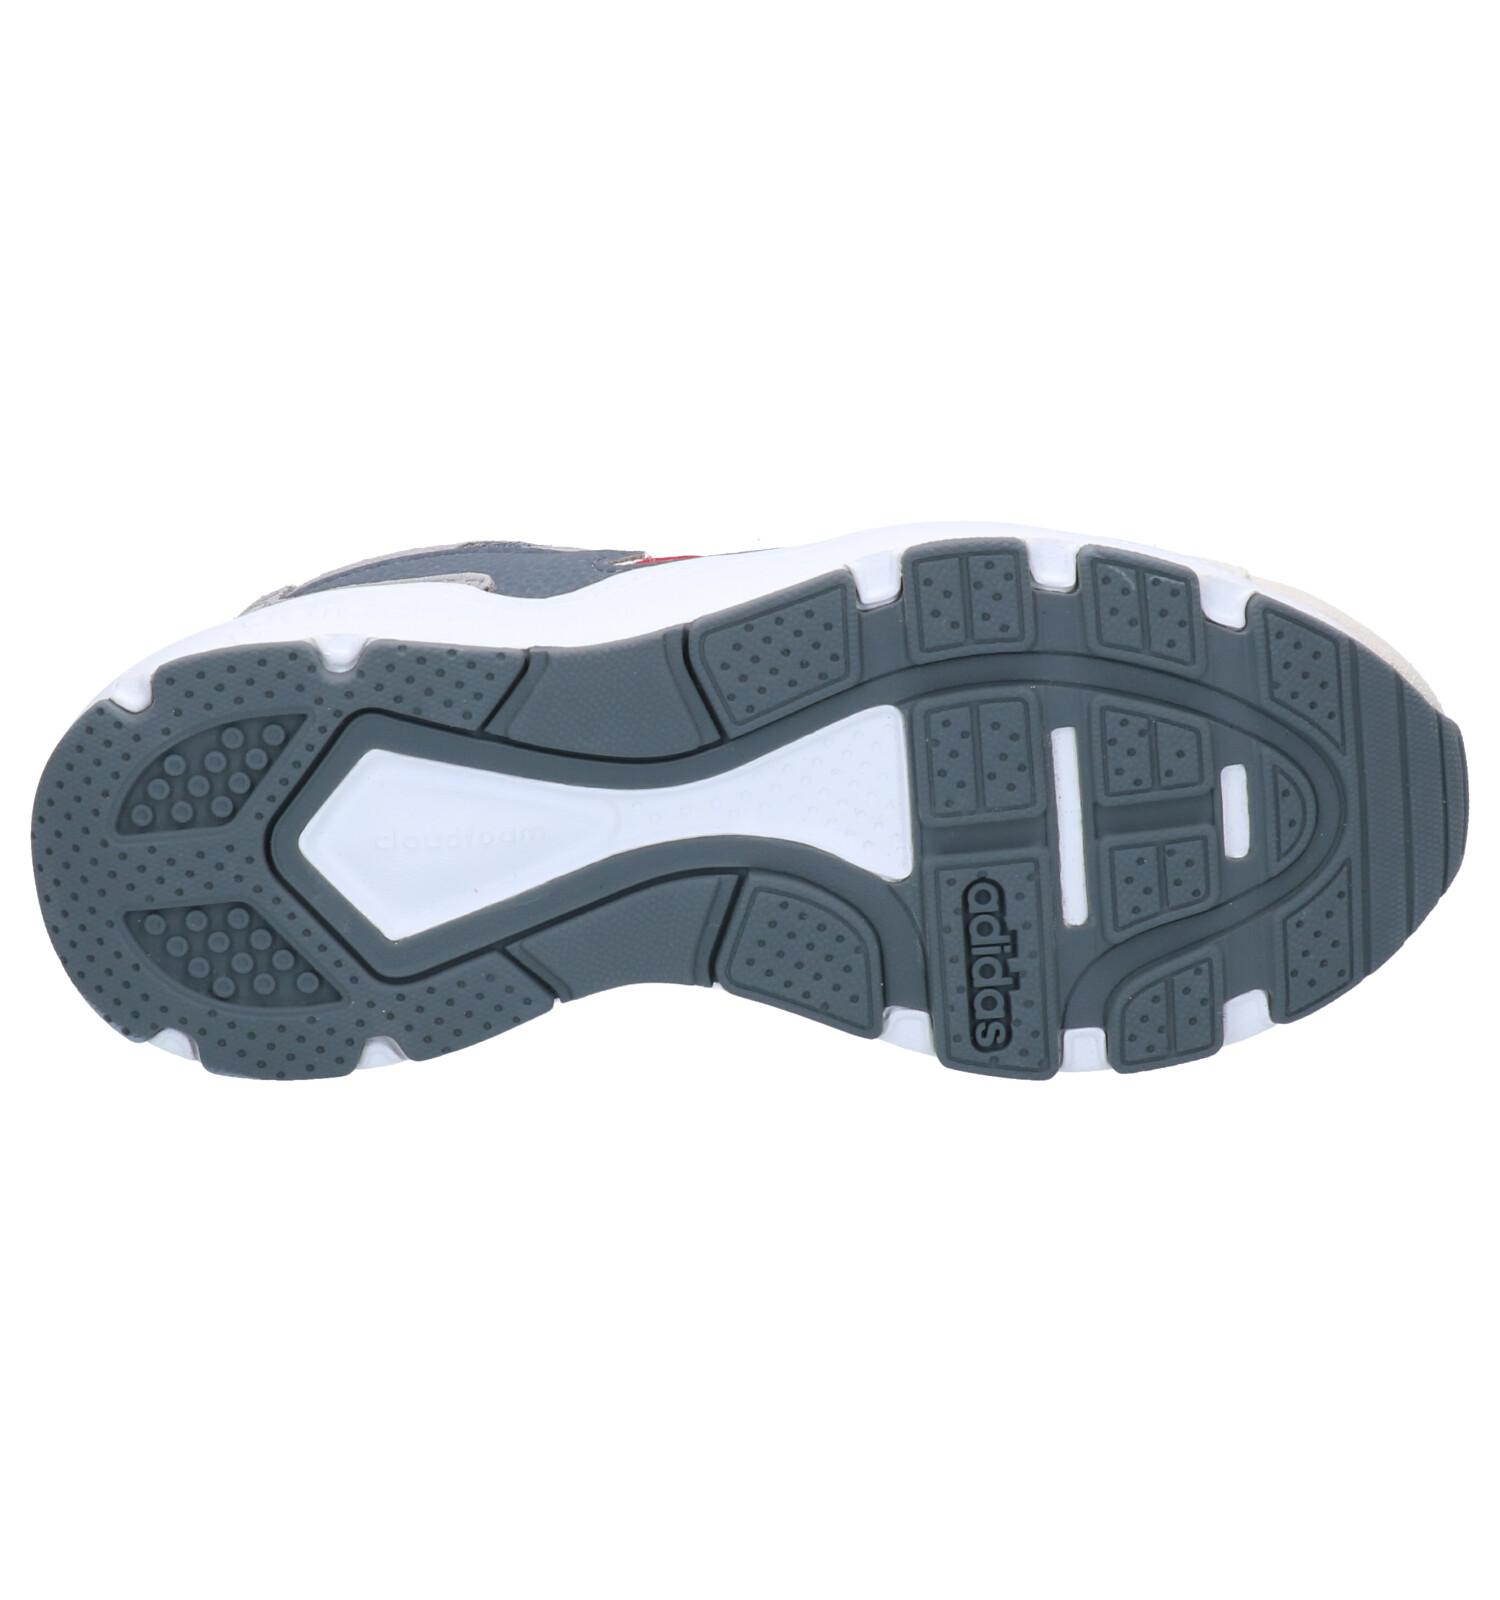 adidas Crazychaos Witte Sportschoenen | SCHOENENTORFS.NL